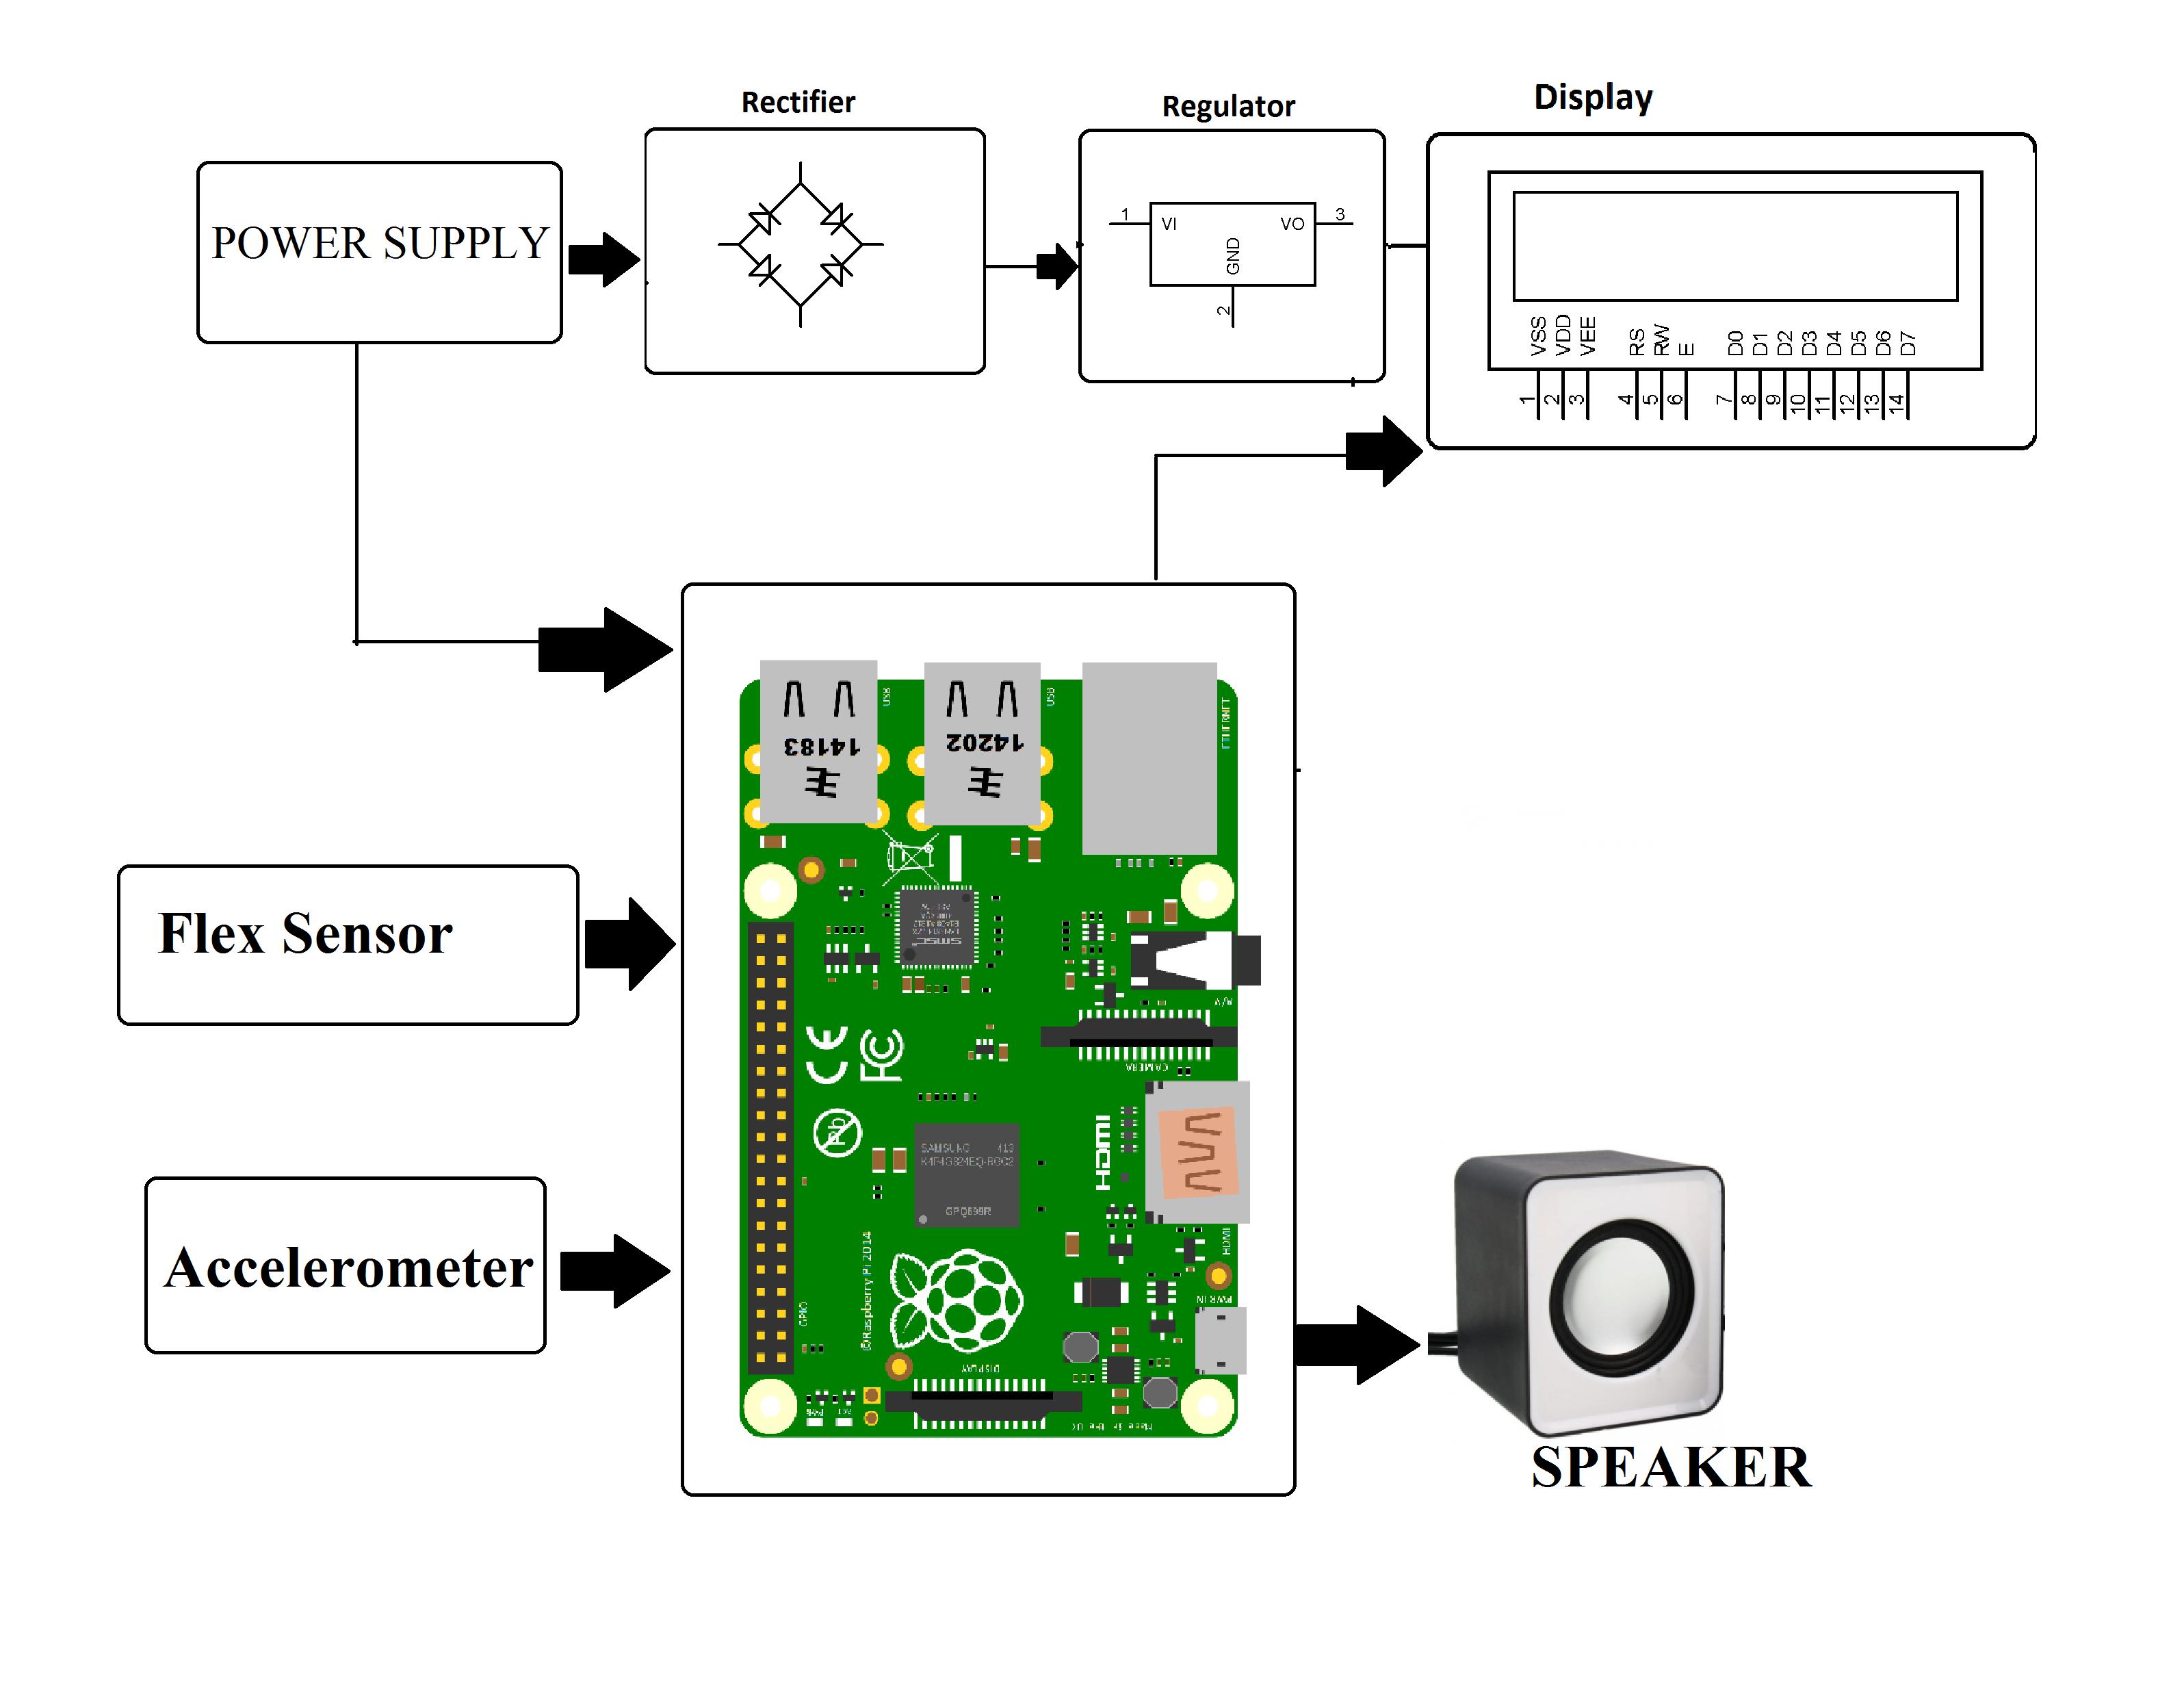 Speaking System For Mute People Using Hand Gestures Accelerometer Sensor Schematic Diagram Block